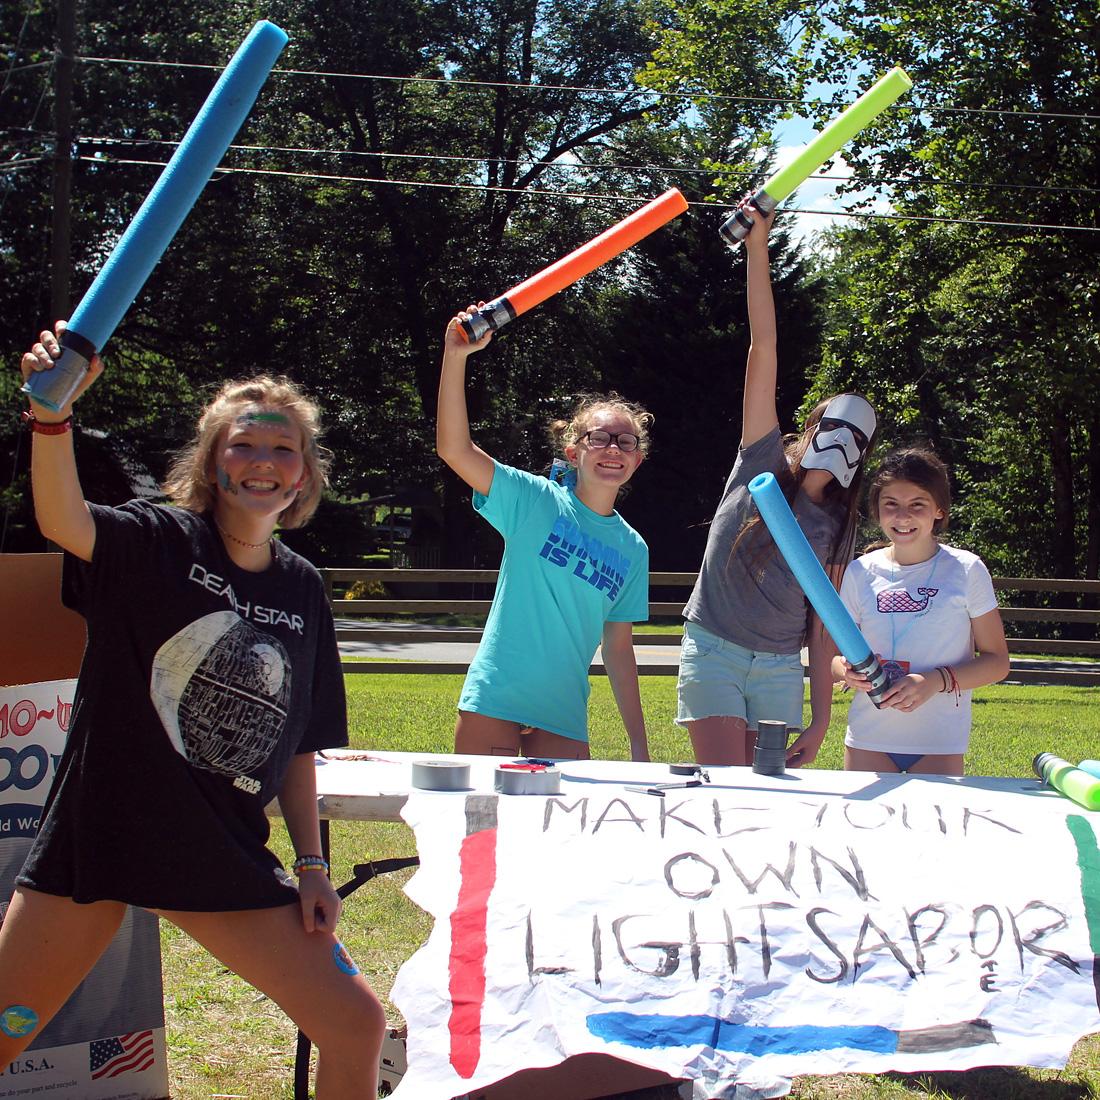 Make a light saber camp project